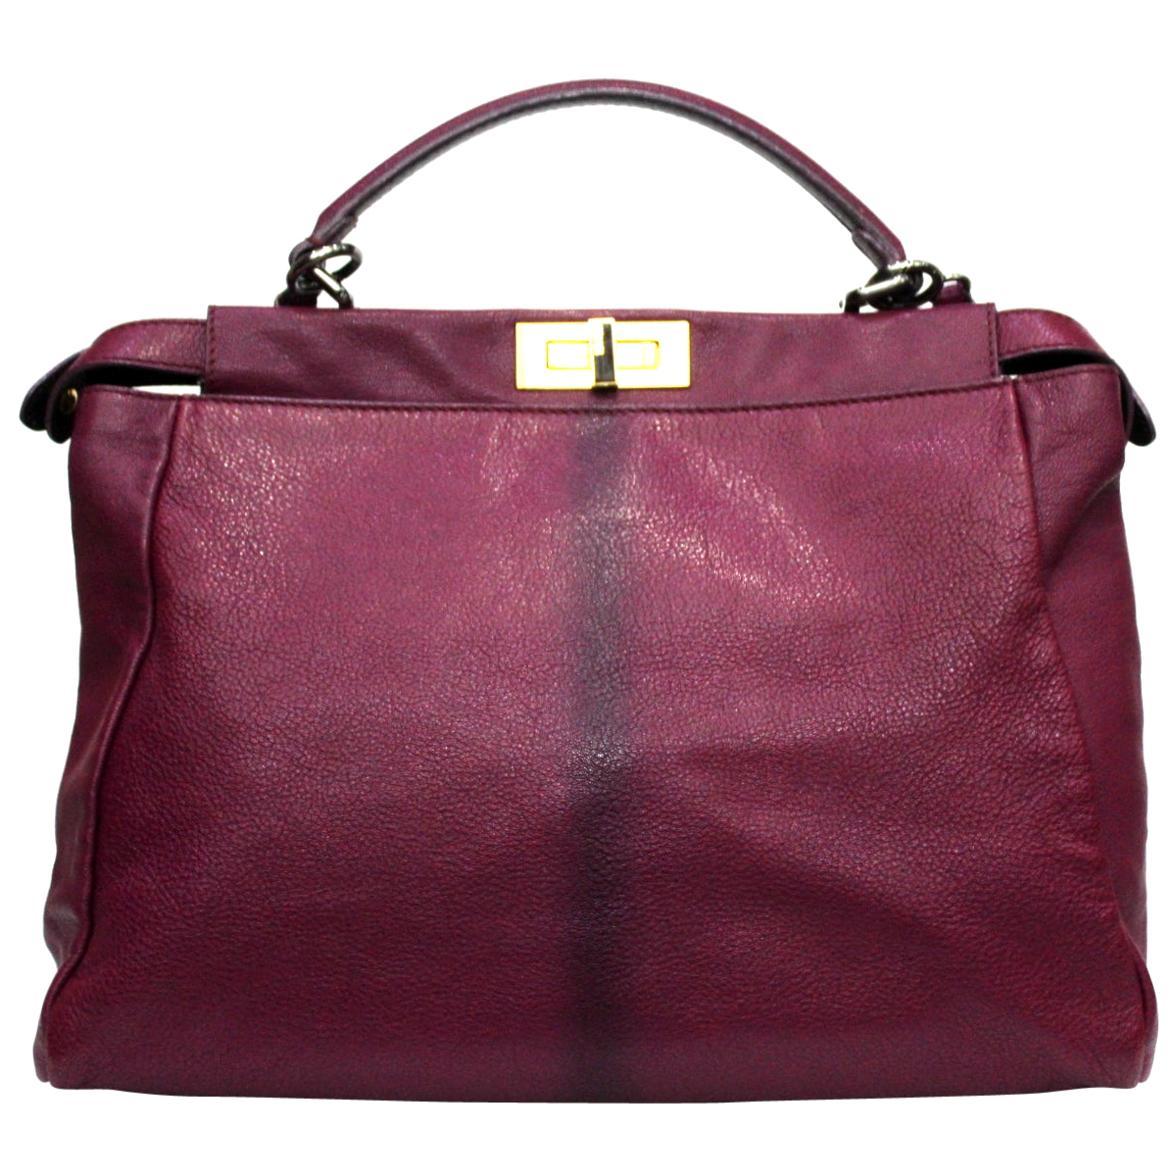 Fendi Peekaboo Large Size Shoulder Bag